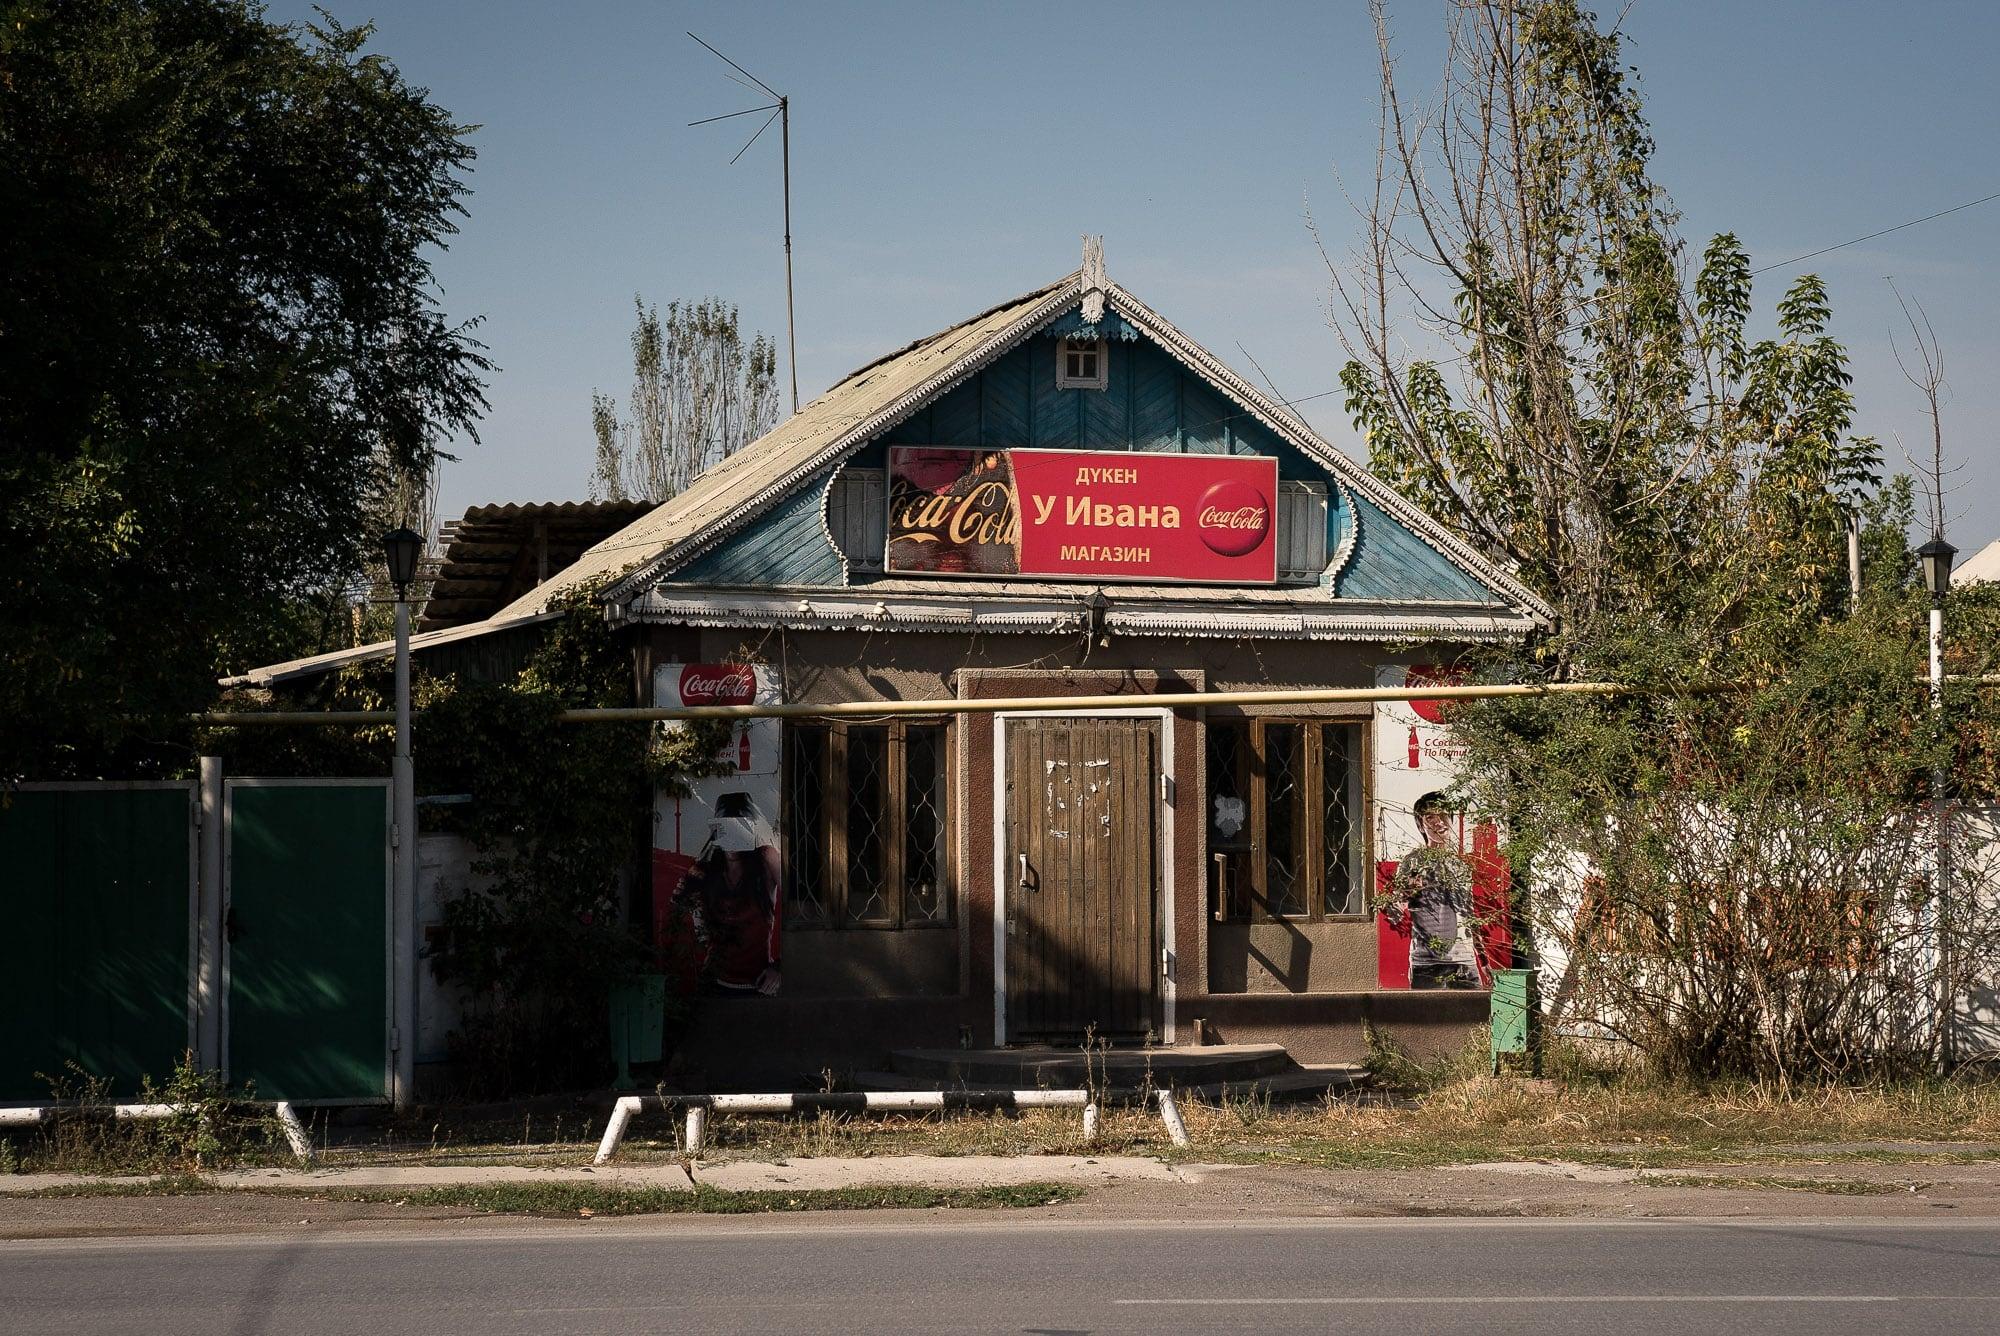 Ivan's shop